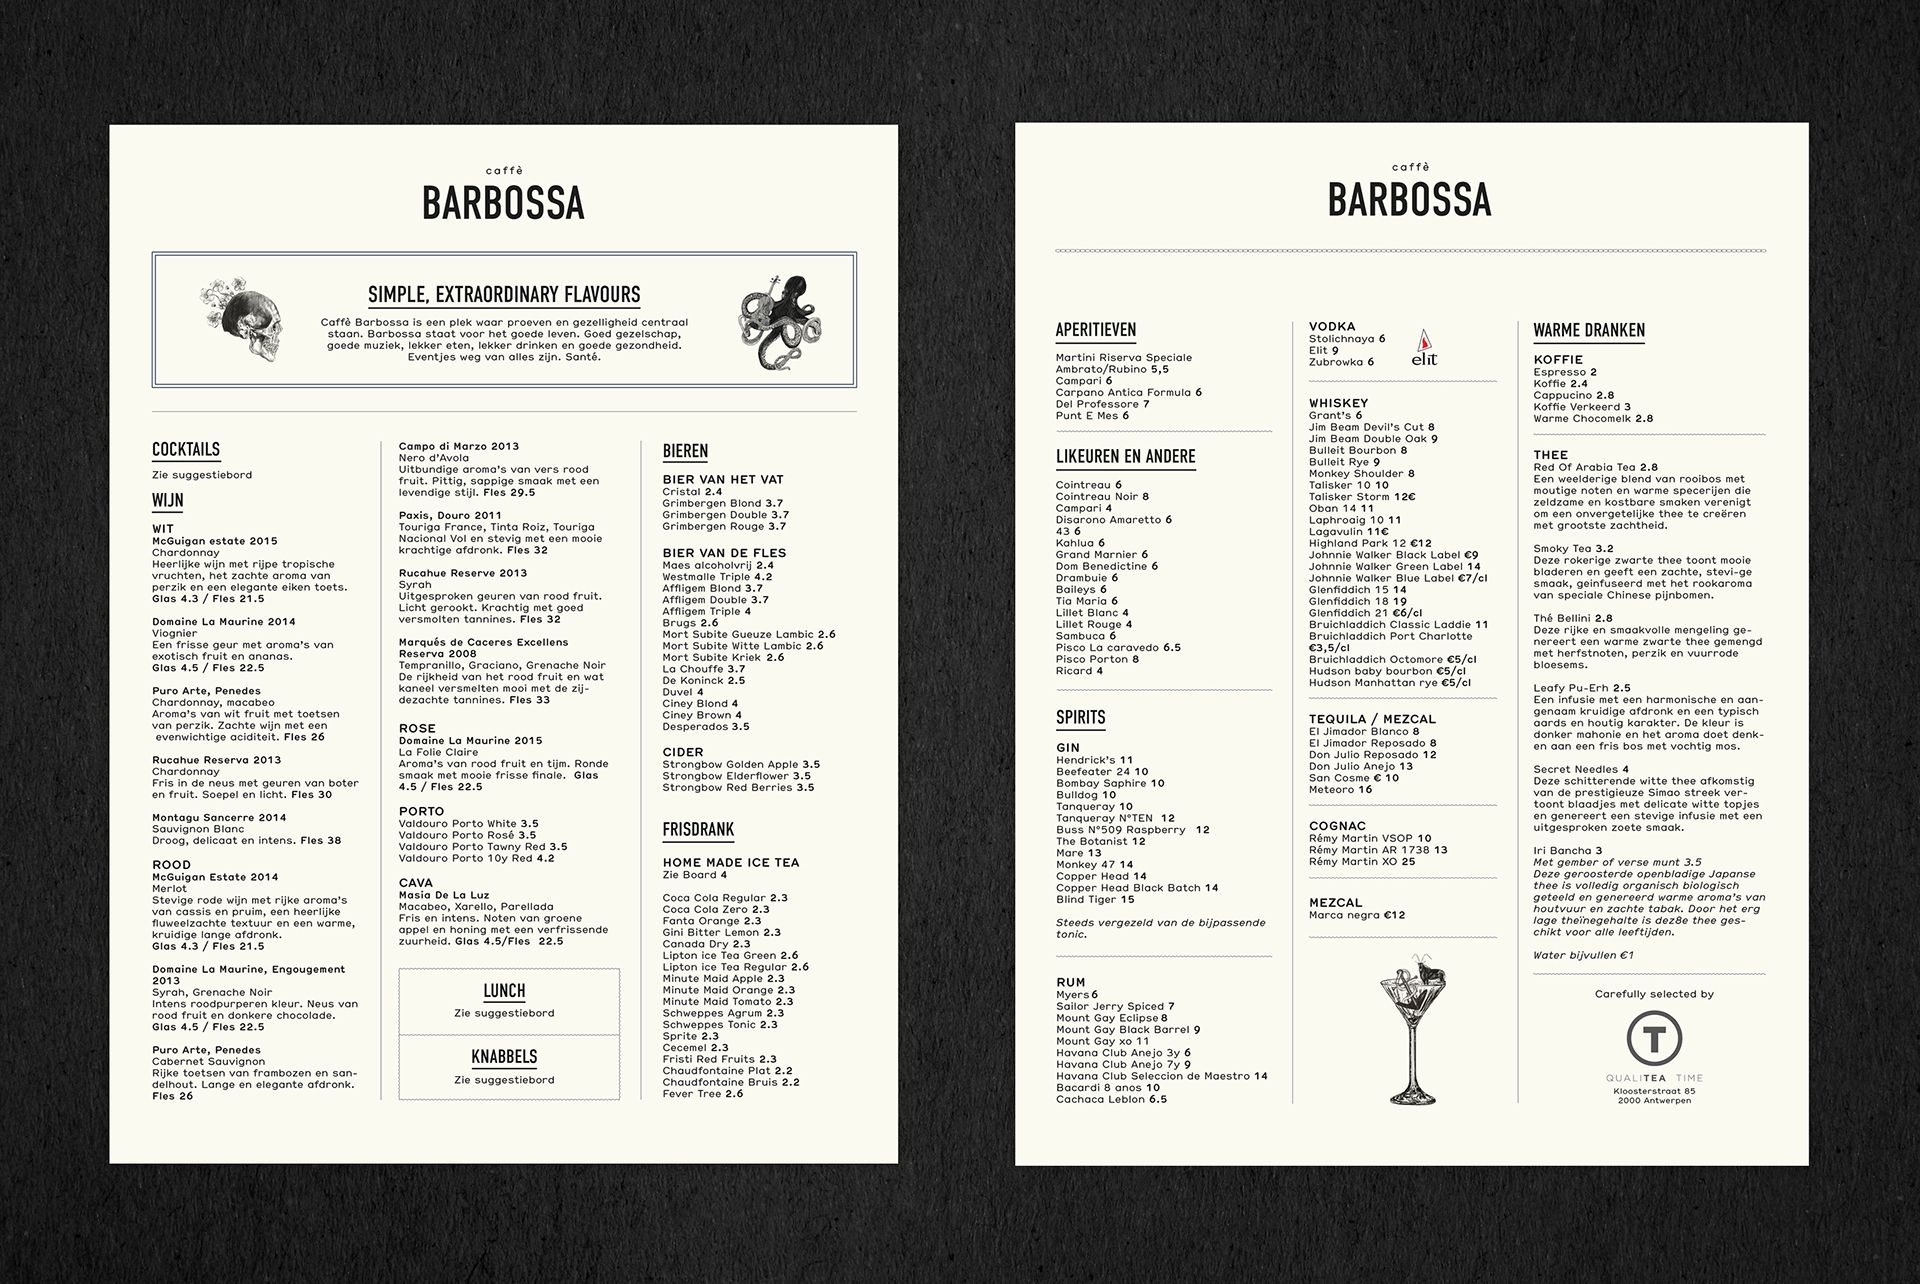 Caffe Barbossa On Behance News Cafe Fun Drinks Caffe